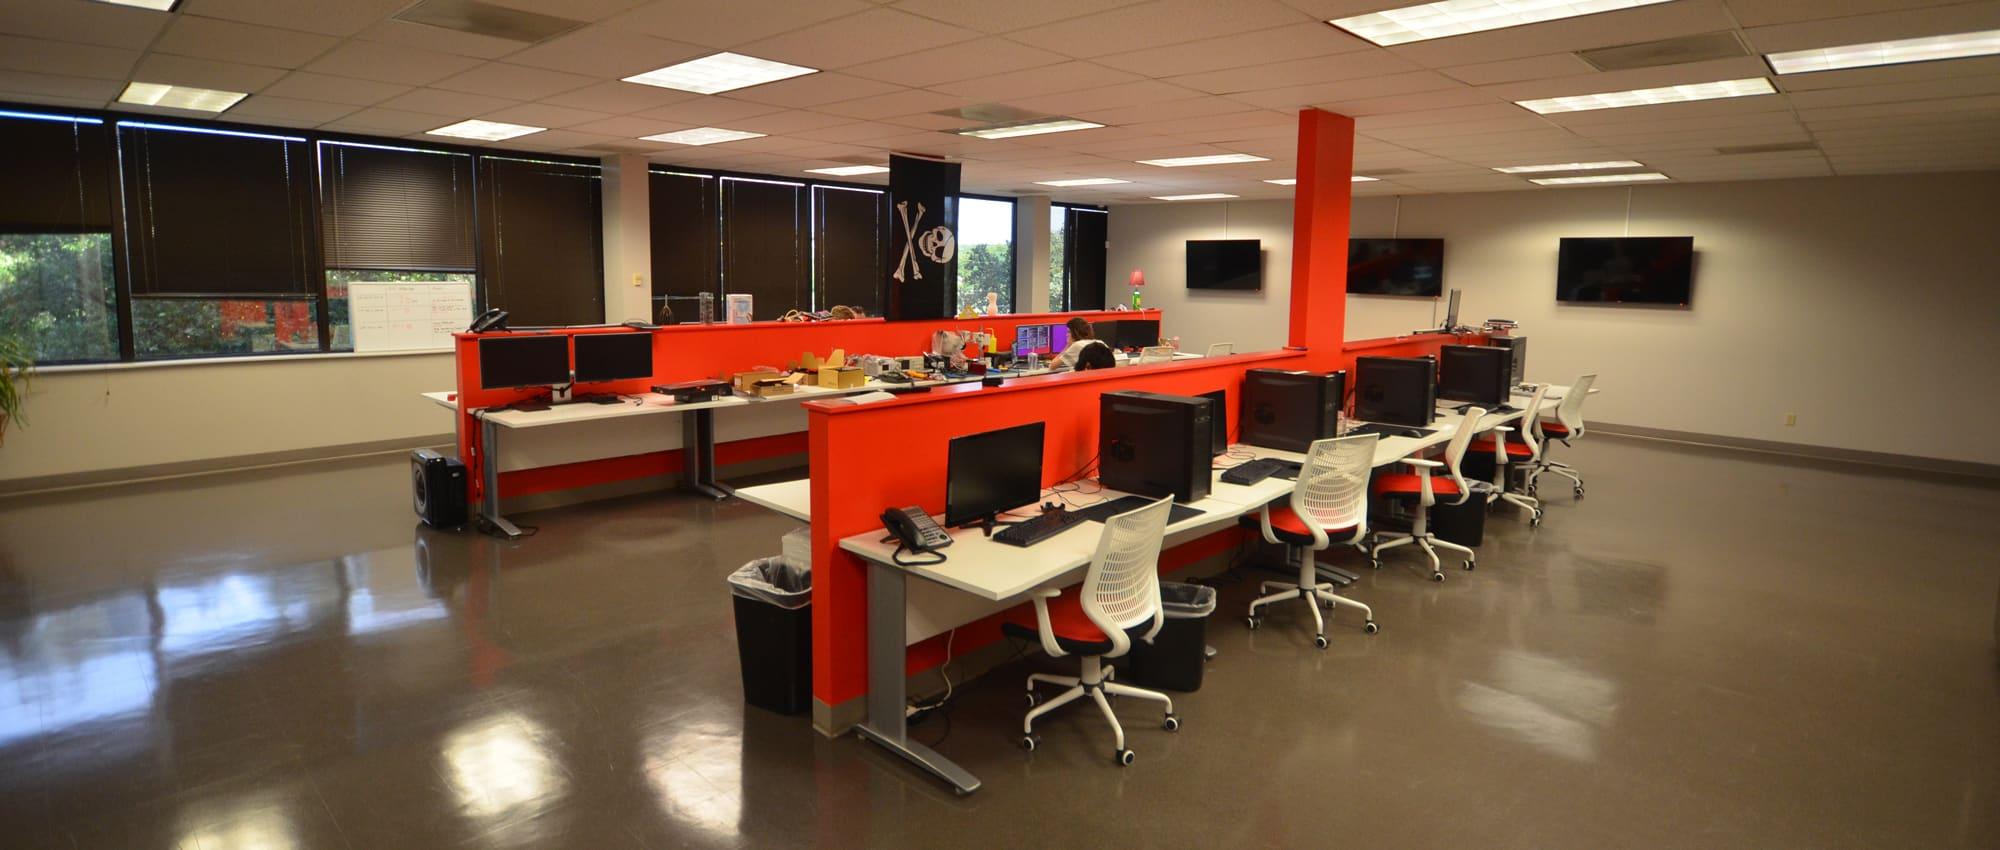 Sublease: Austin Oaks Travis Building Office Space   3520 Executive Center Drive in Austin, Texas